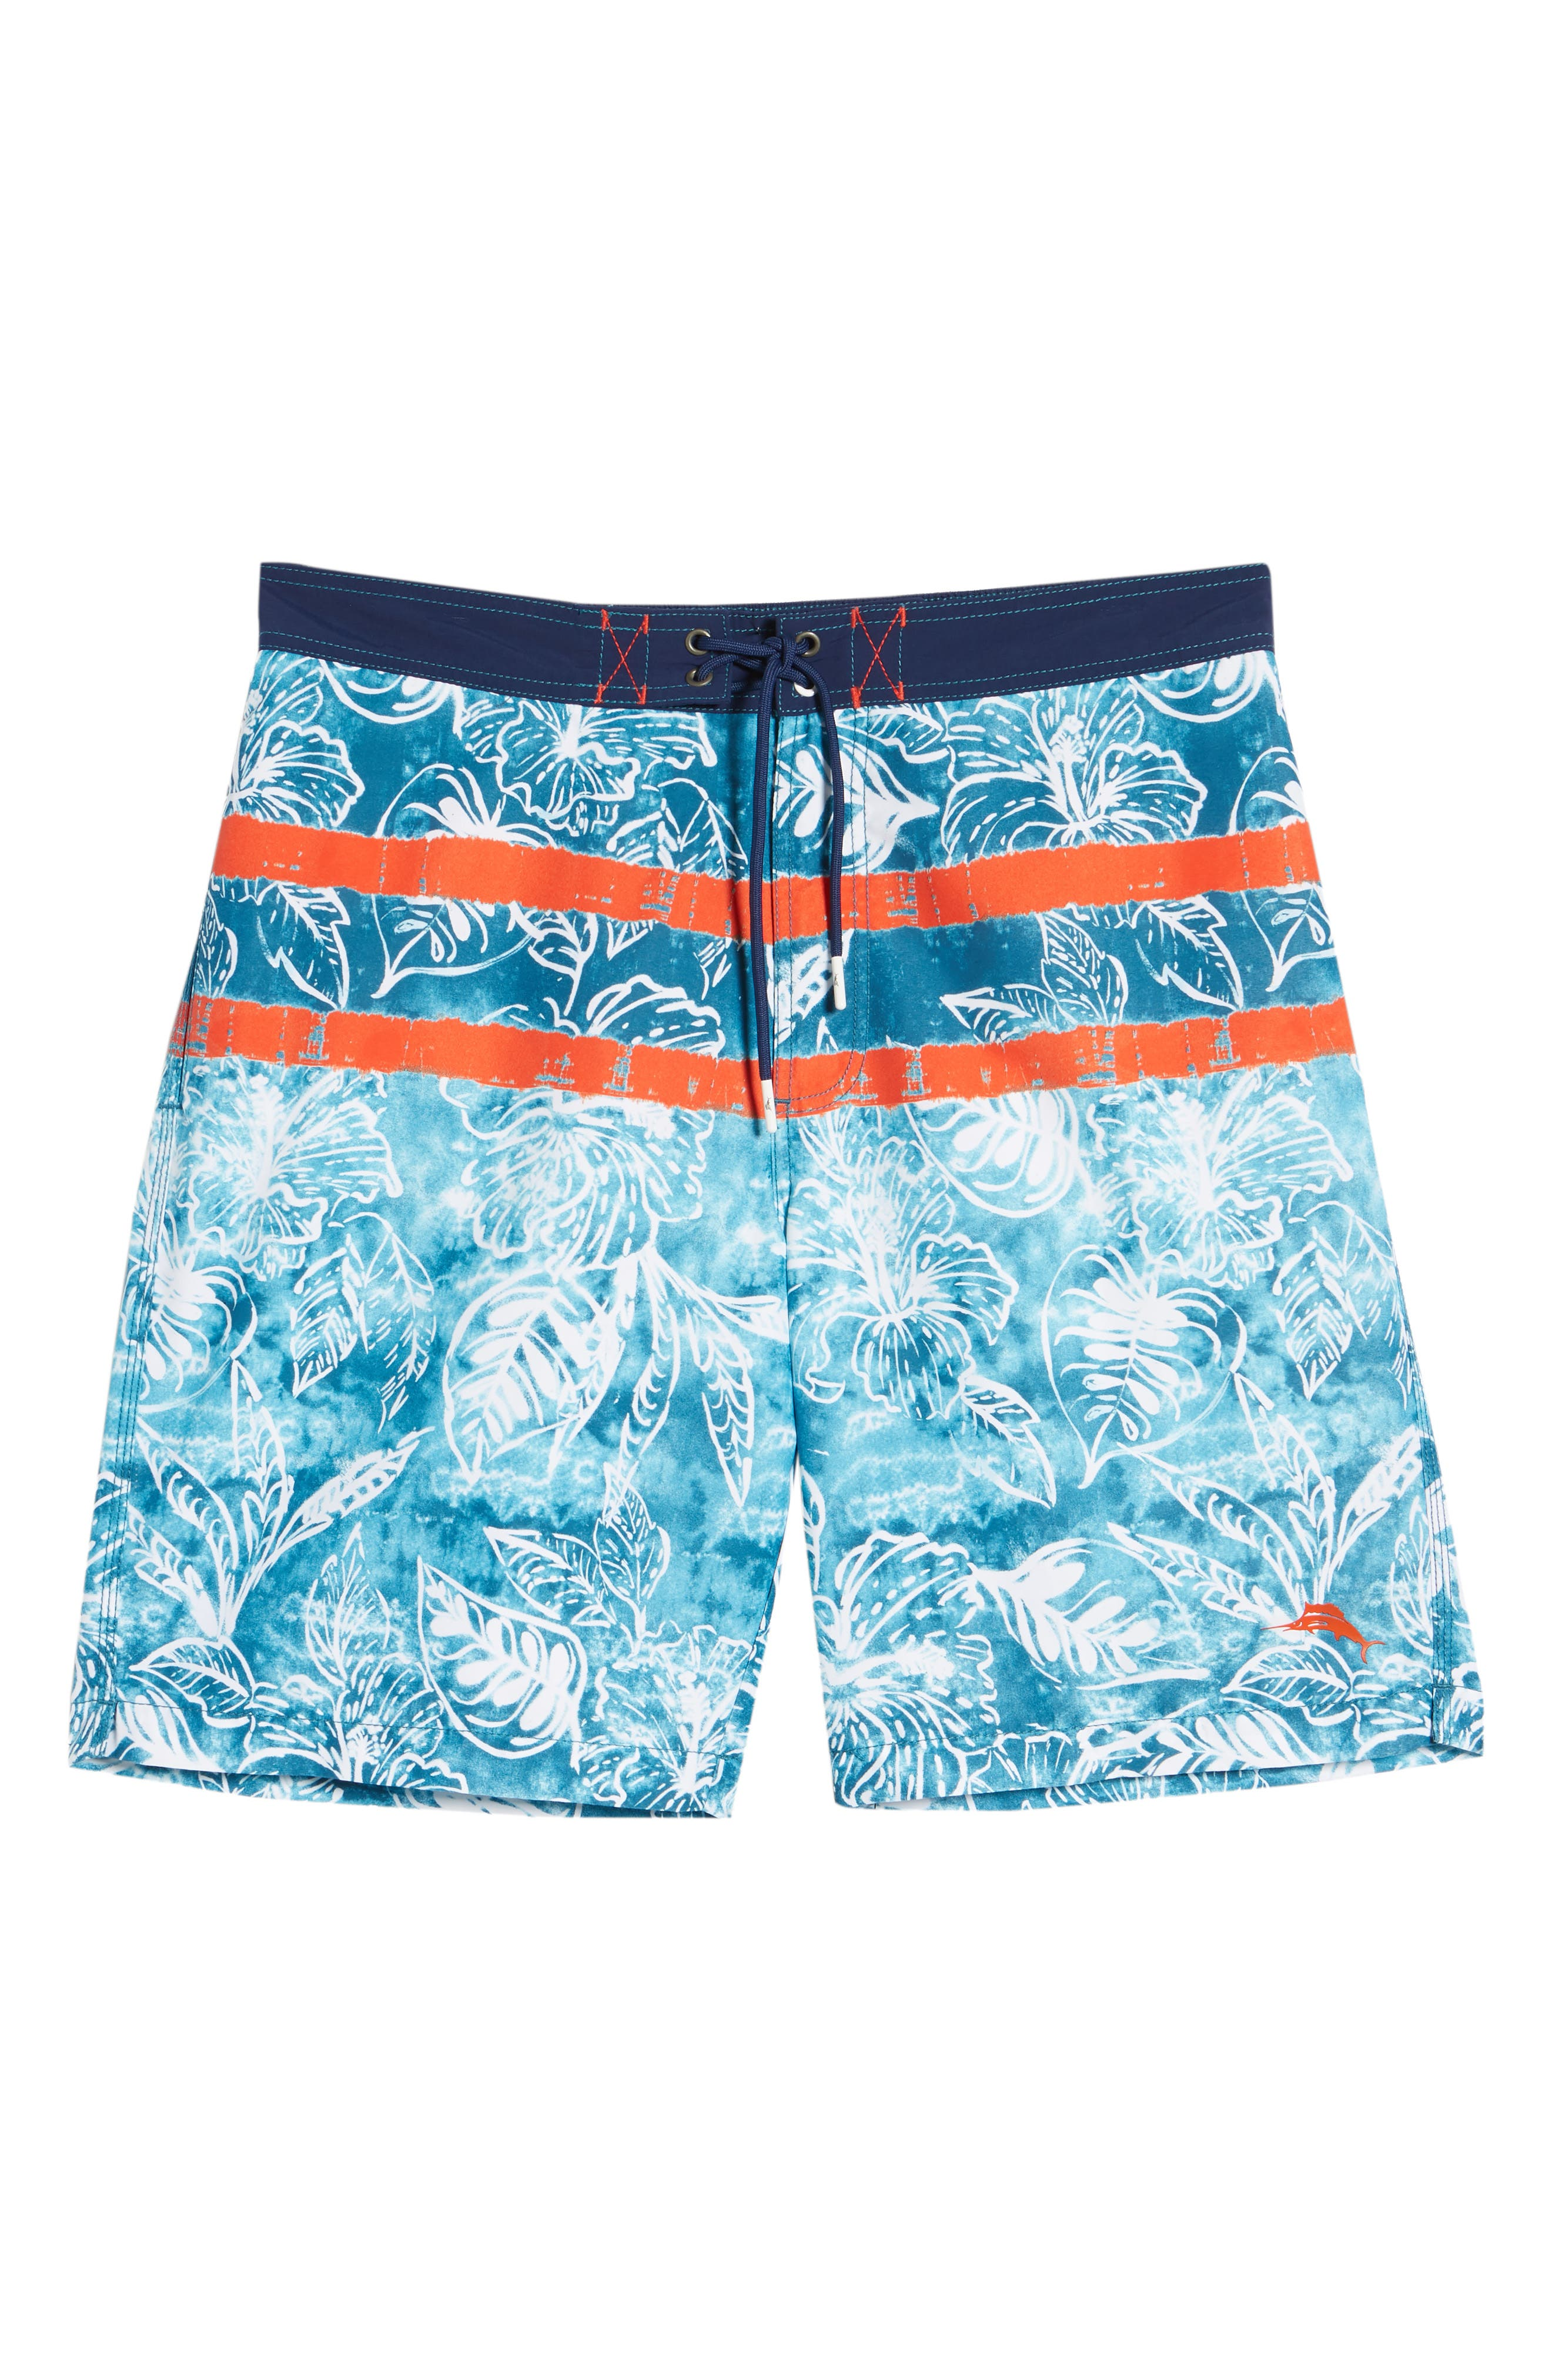 Baja Mar Batik Print Board Shorts,                             Alternate thumbnail 6, color,                             RIVIERA AZURE